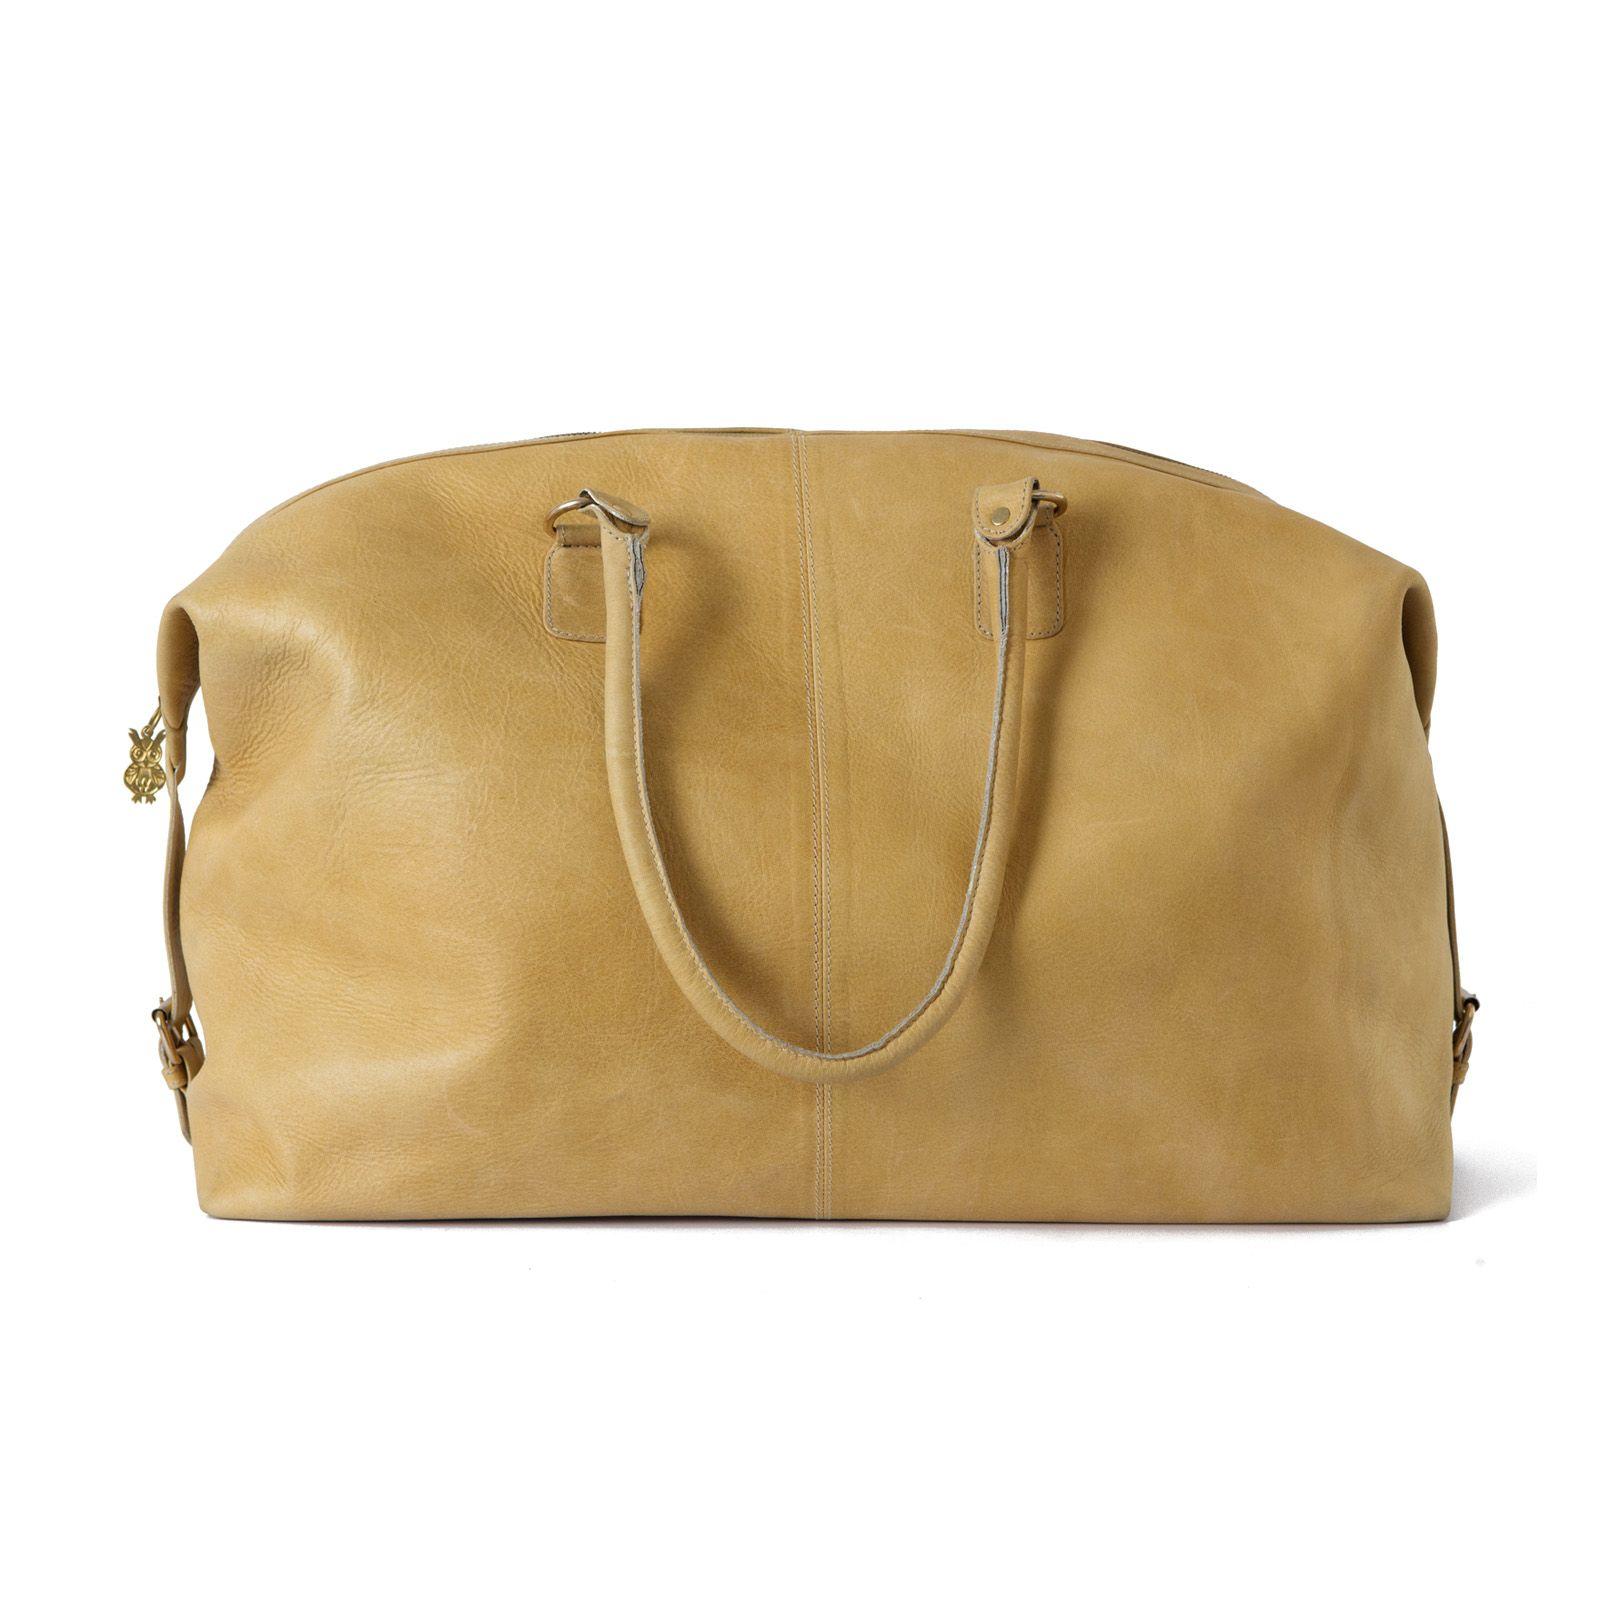 Cargo bags by cynthia bailey